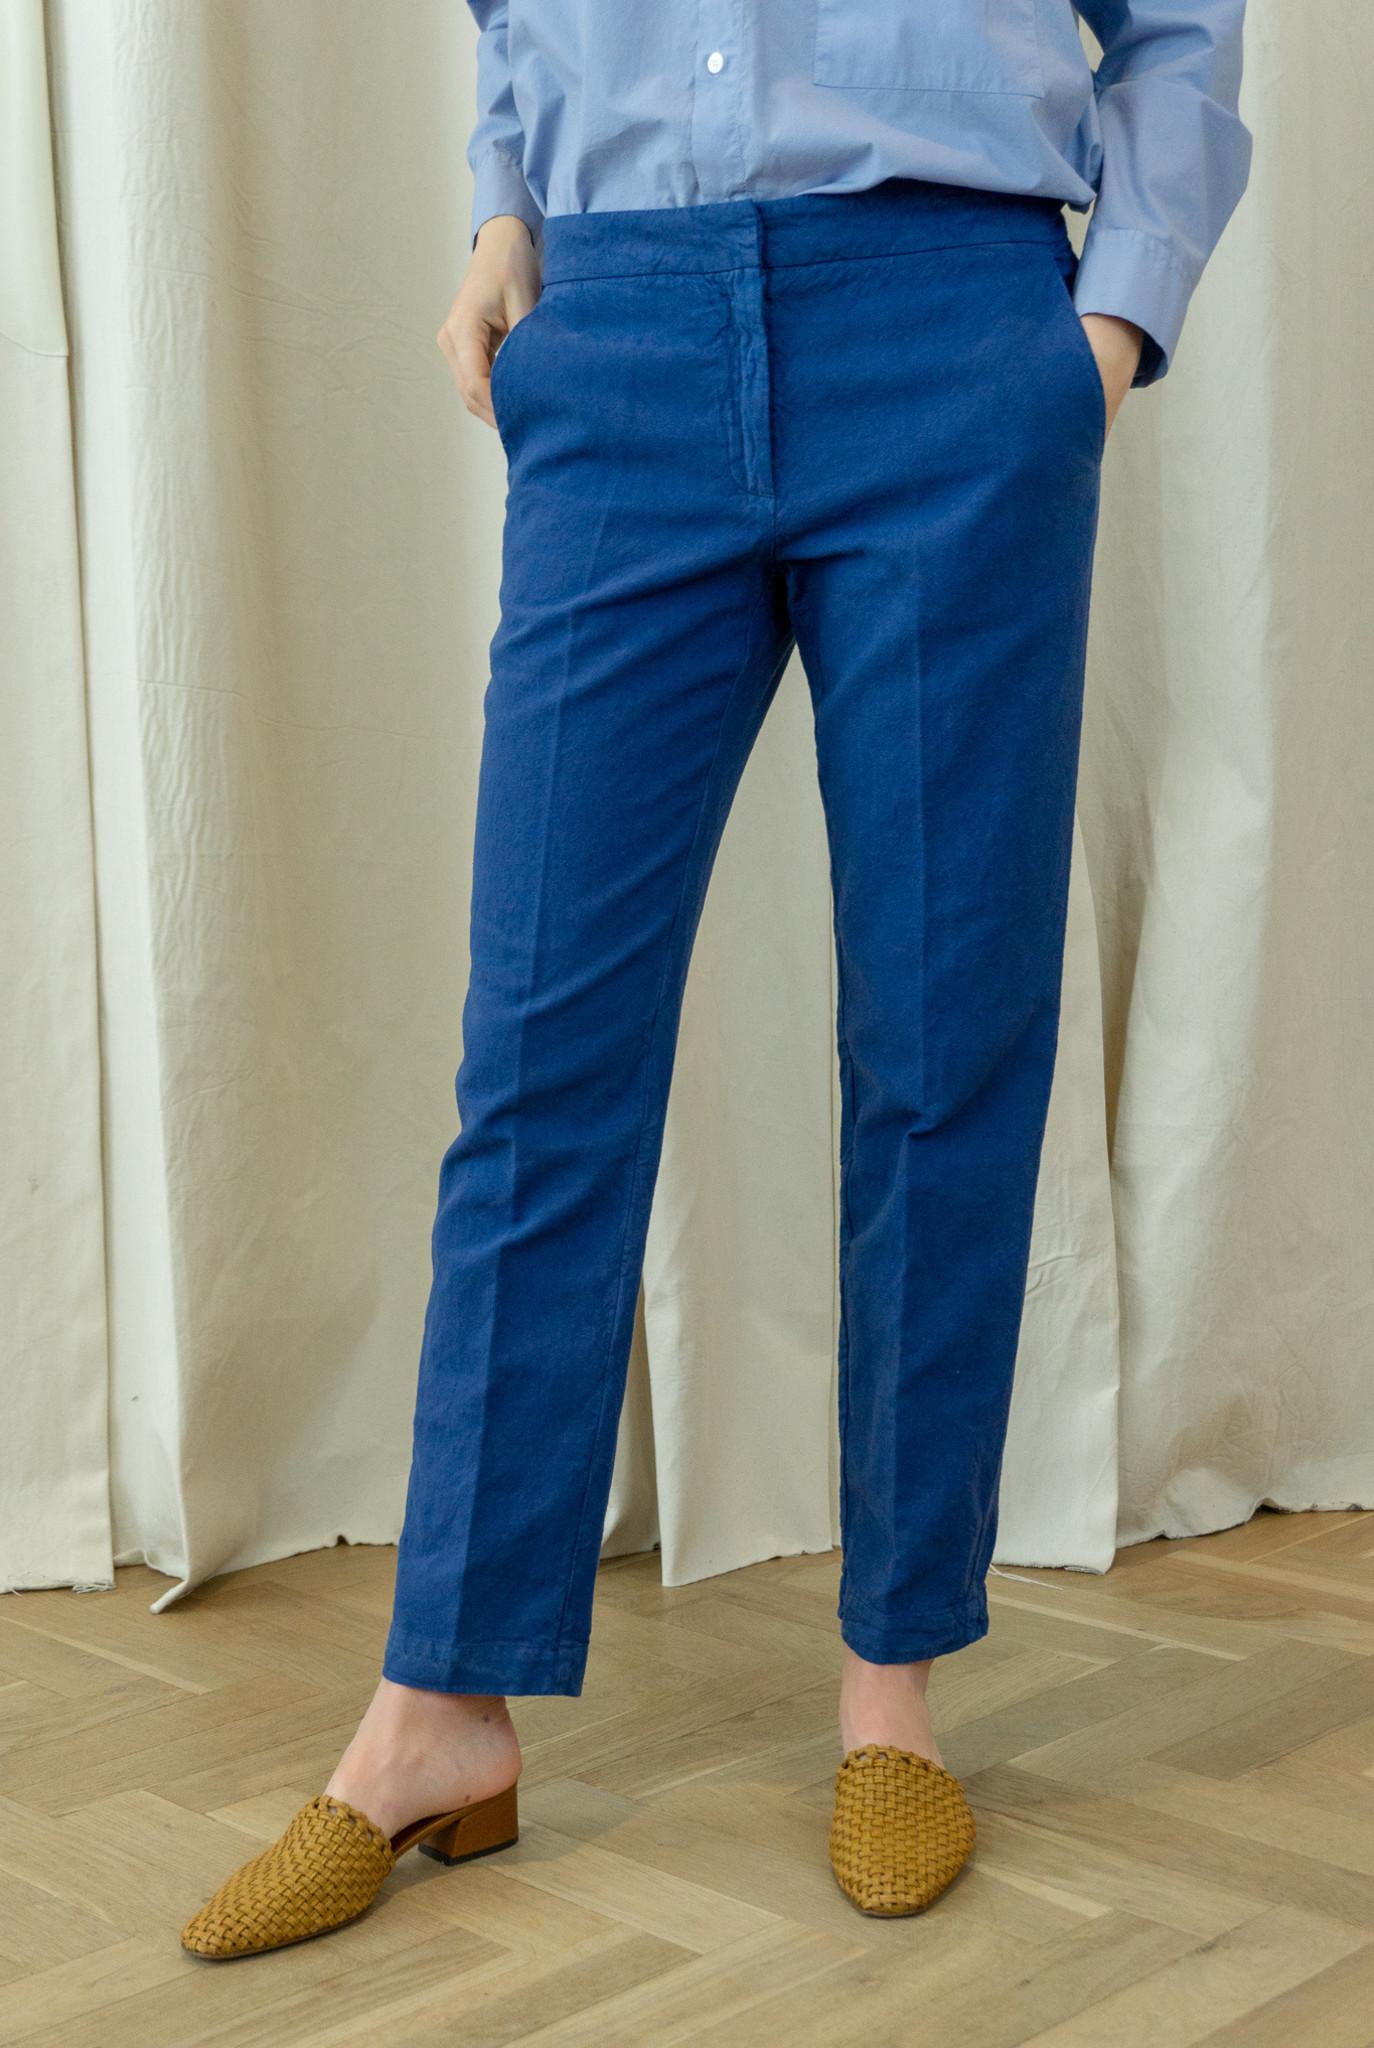 Cigarette trouser ink blue